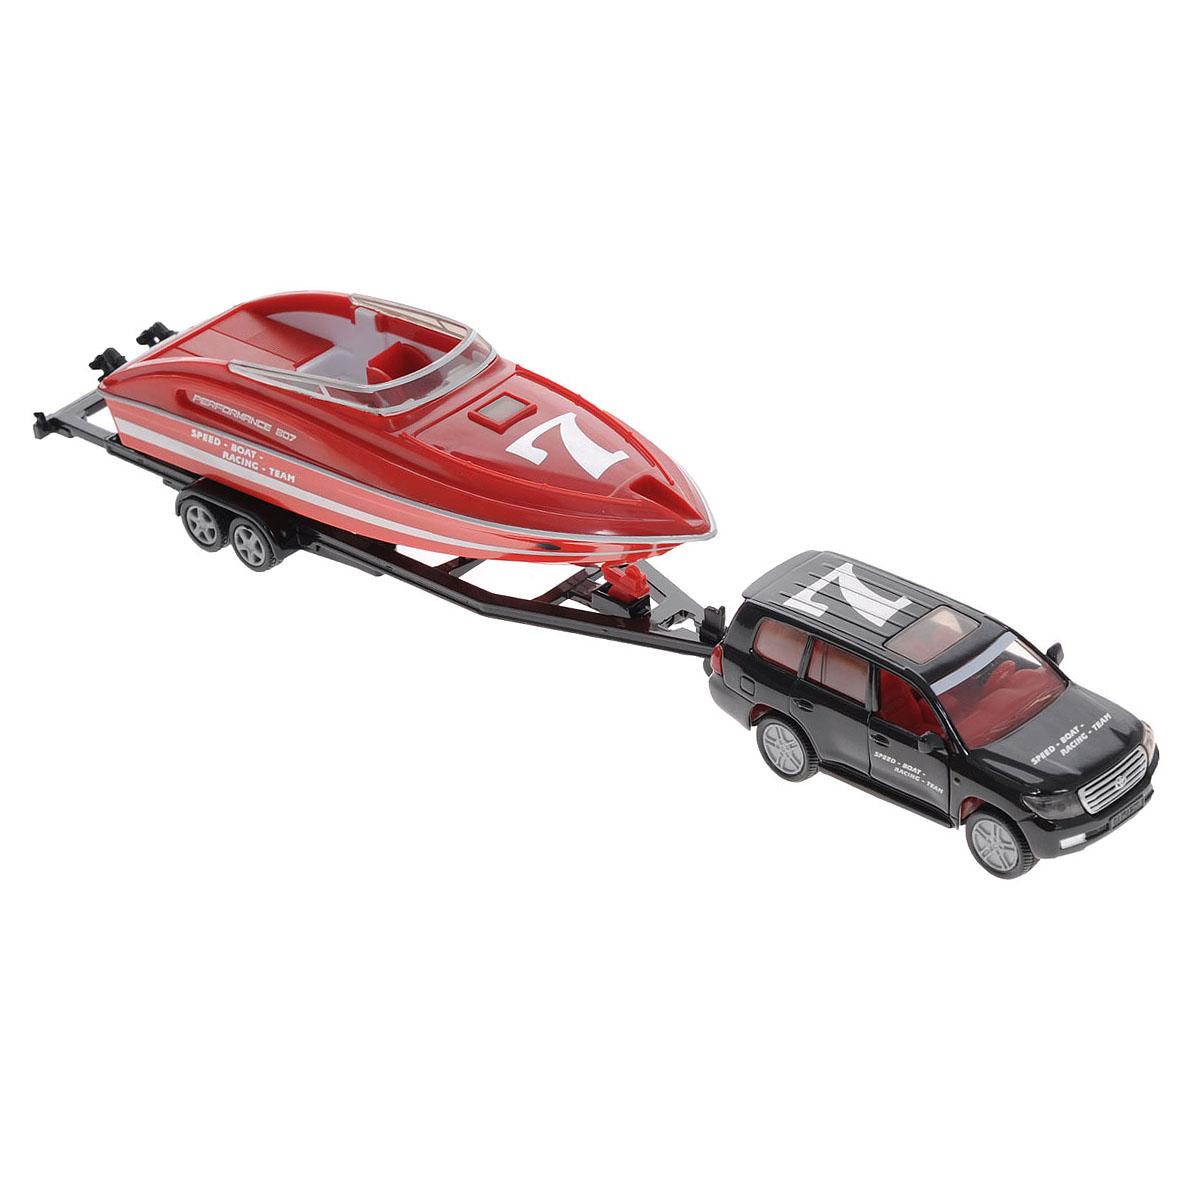 Siku Модель автомобиля Audi Q7 с катером siku тягач с катером